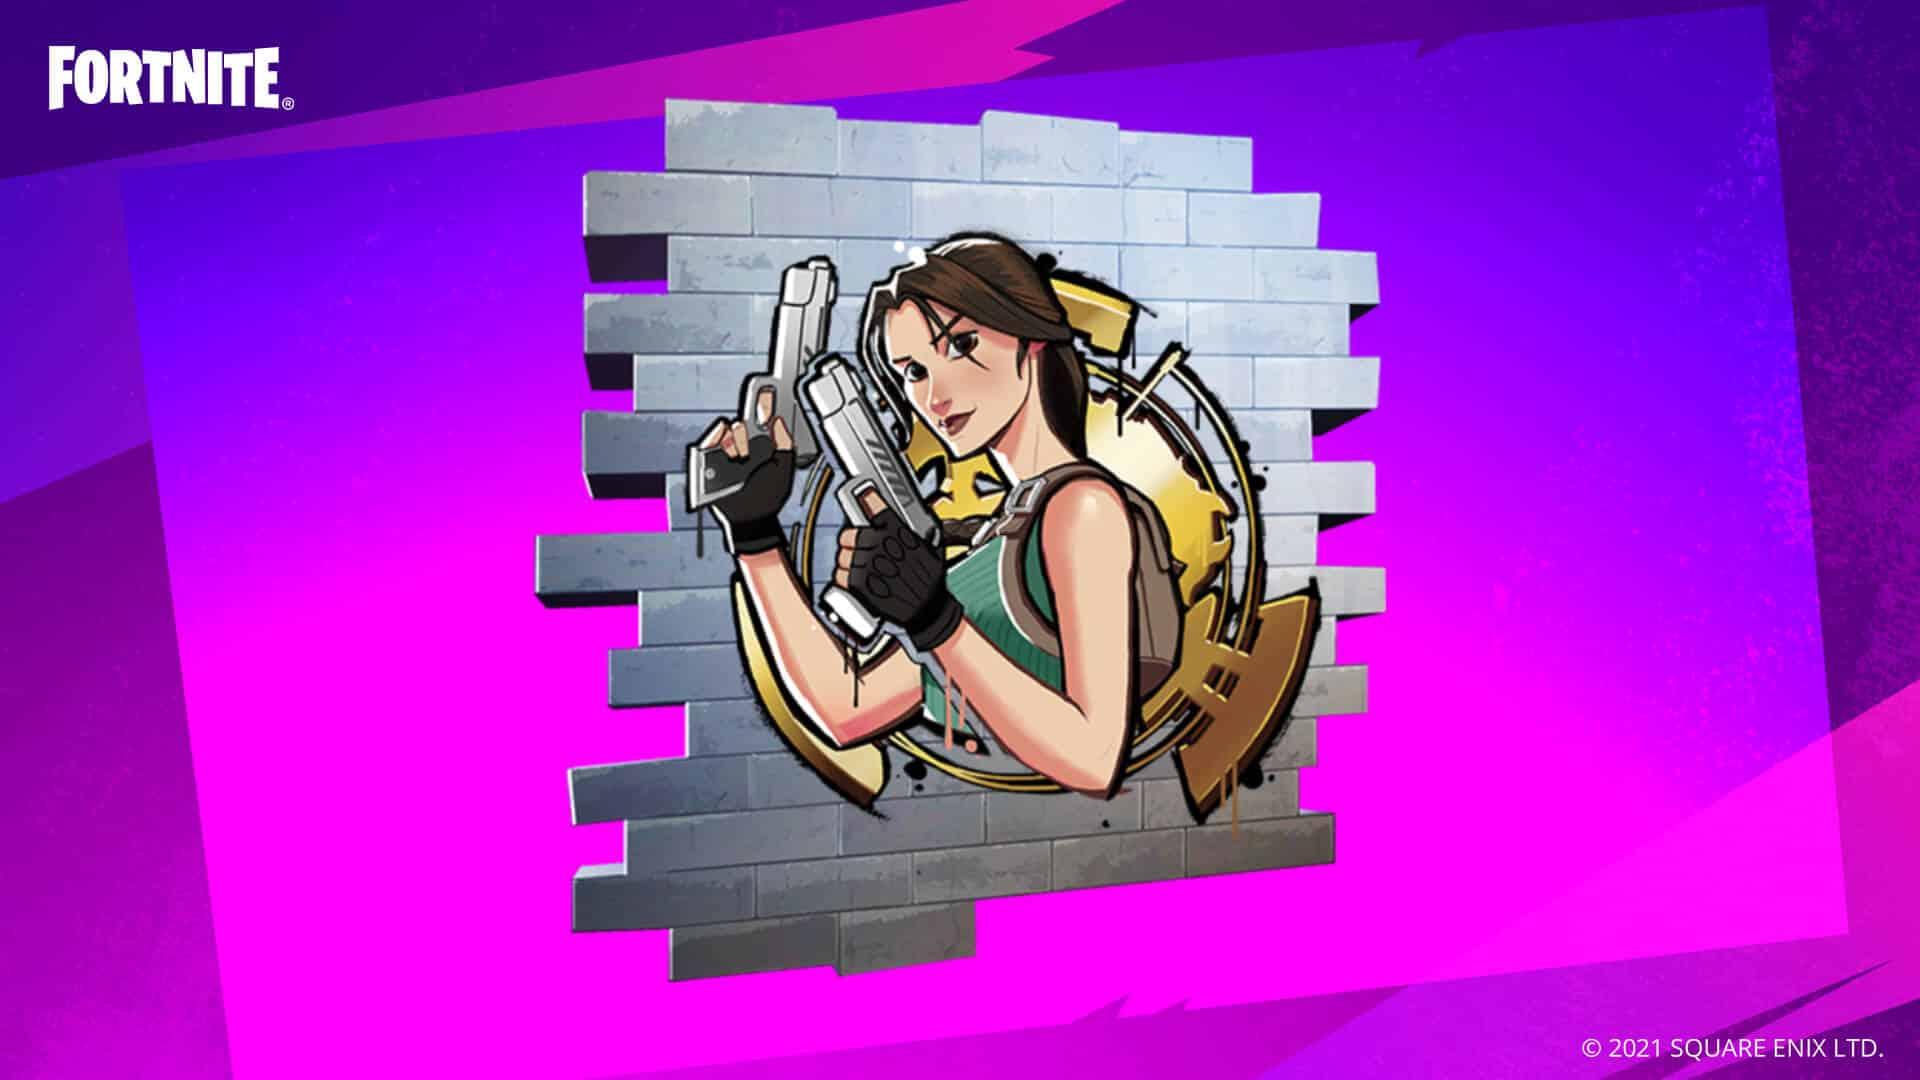 Fortnite: How To Get Free Lara Croft Manor Experience Spray